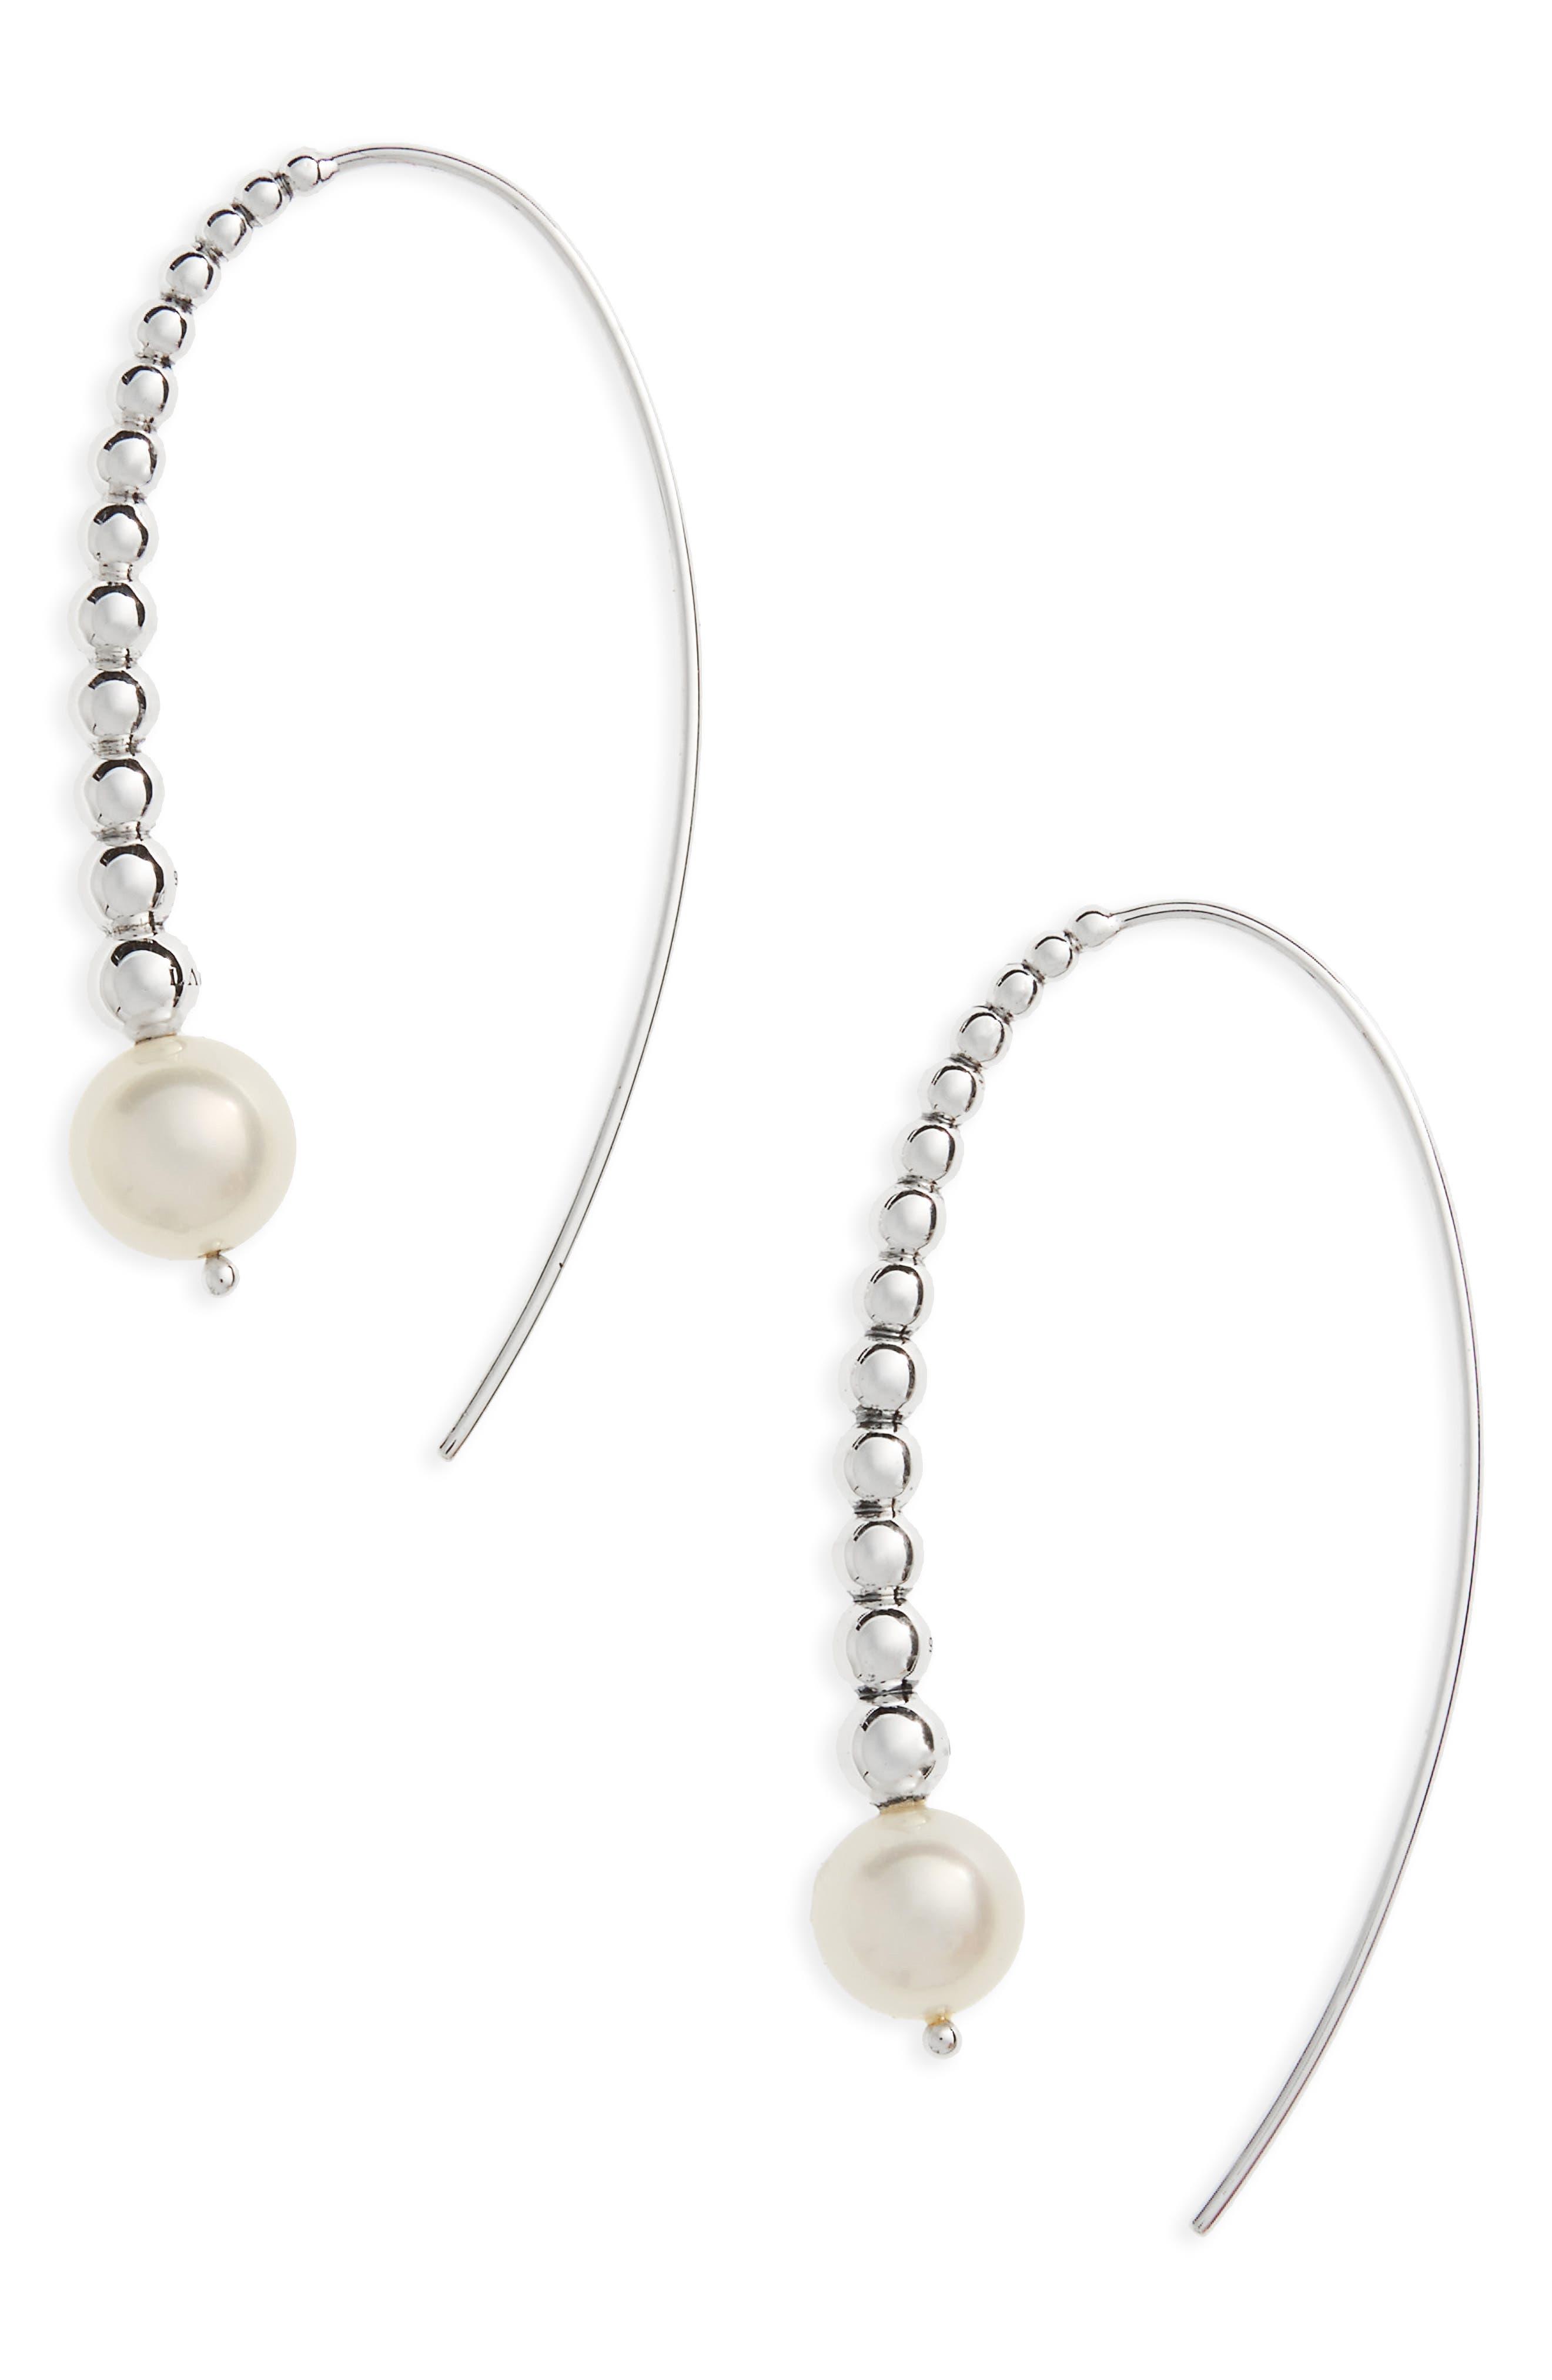 Threader Pearl Earrings,                             Main thumbnail 1, color,                             Silver